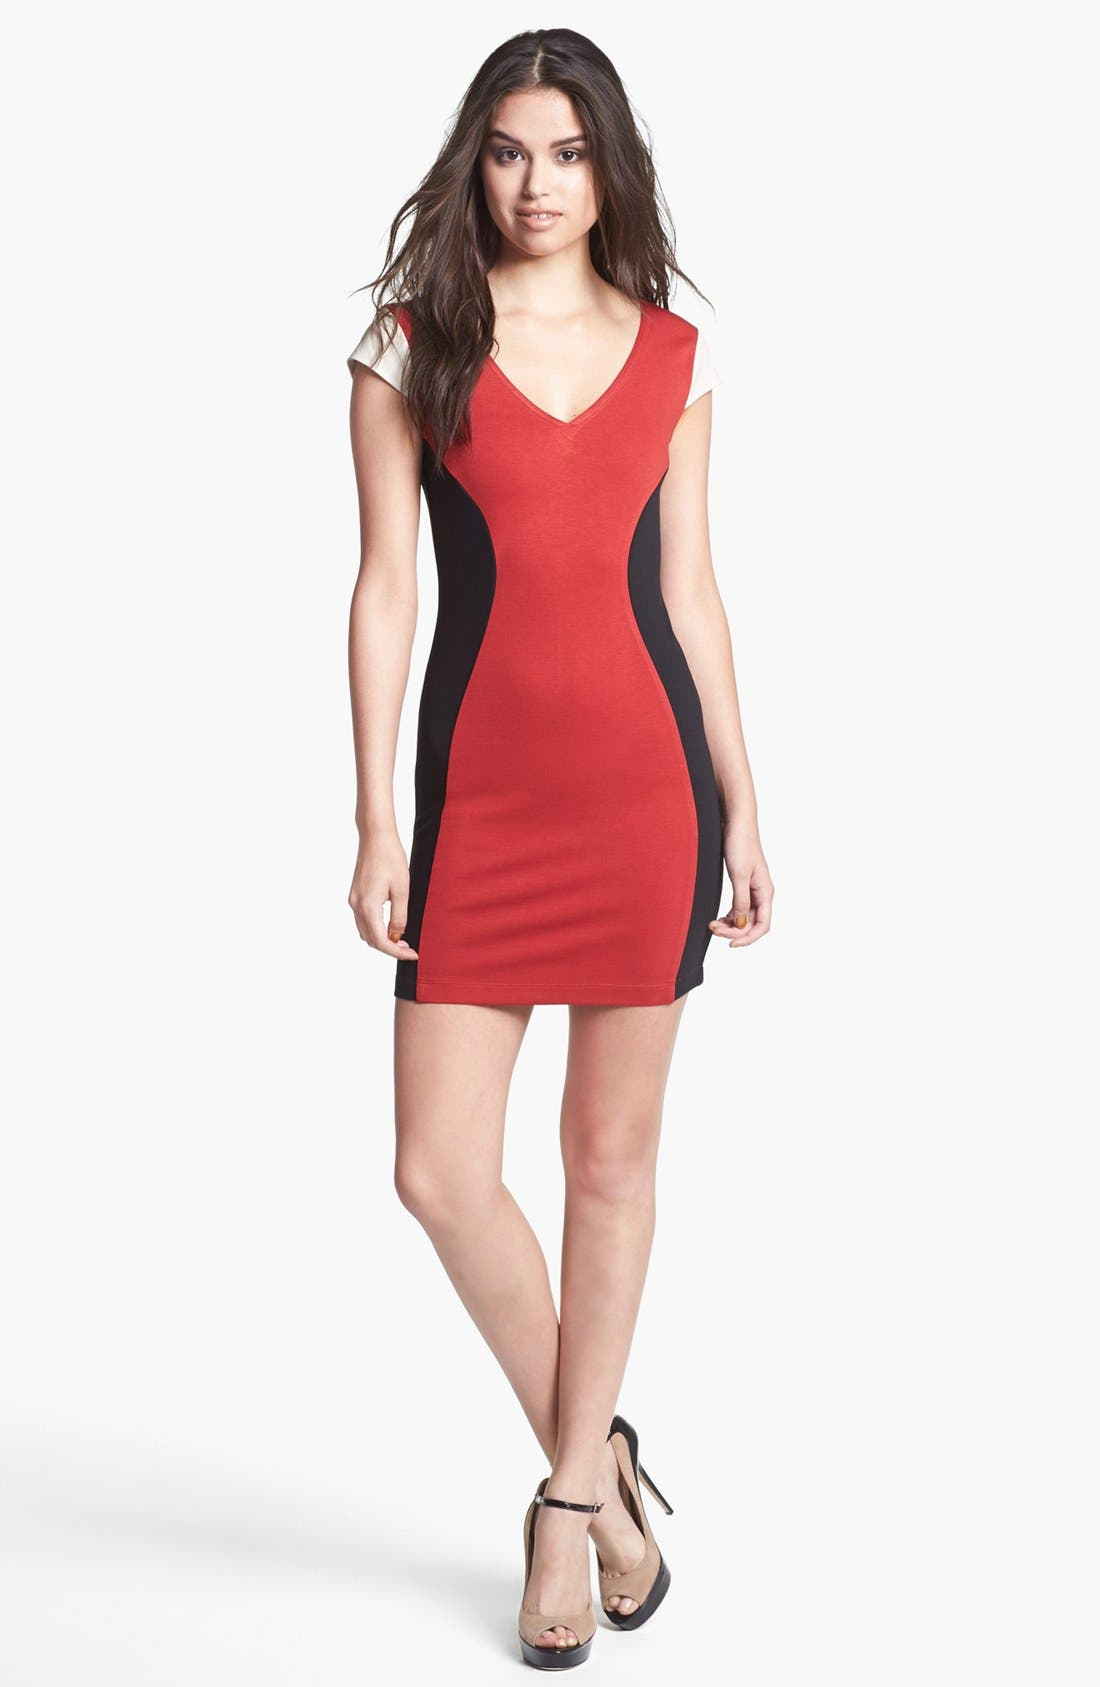 Alternate Image 1 Selected - Madison Marcus Faux Leather Sleeve Colorblock Sheath Dress